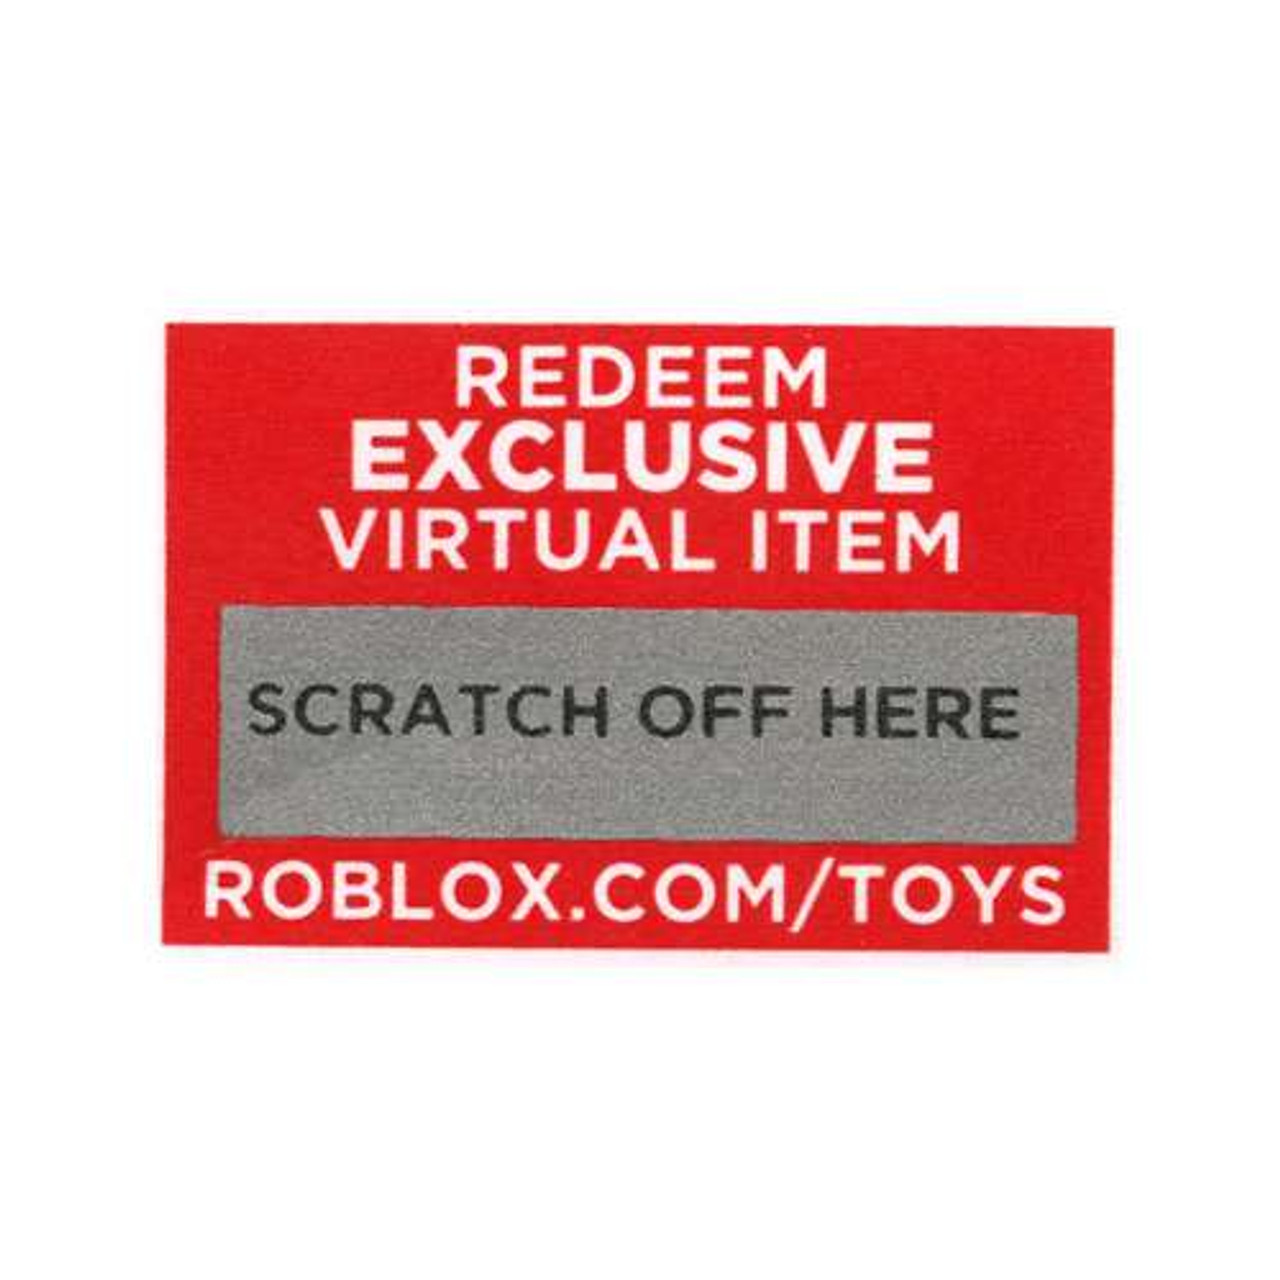 Roblox Redeem 1 Musical Virtual Item Online Code Jazwares Toywiz